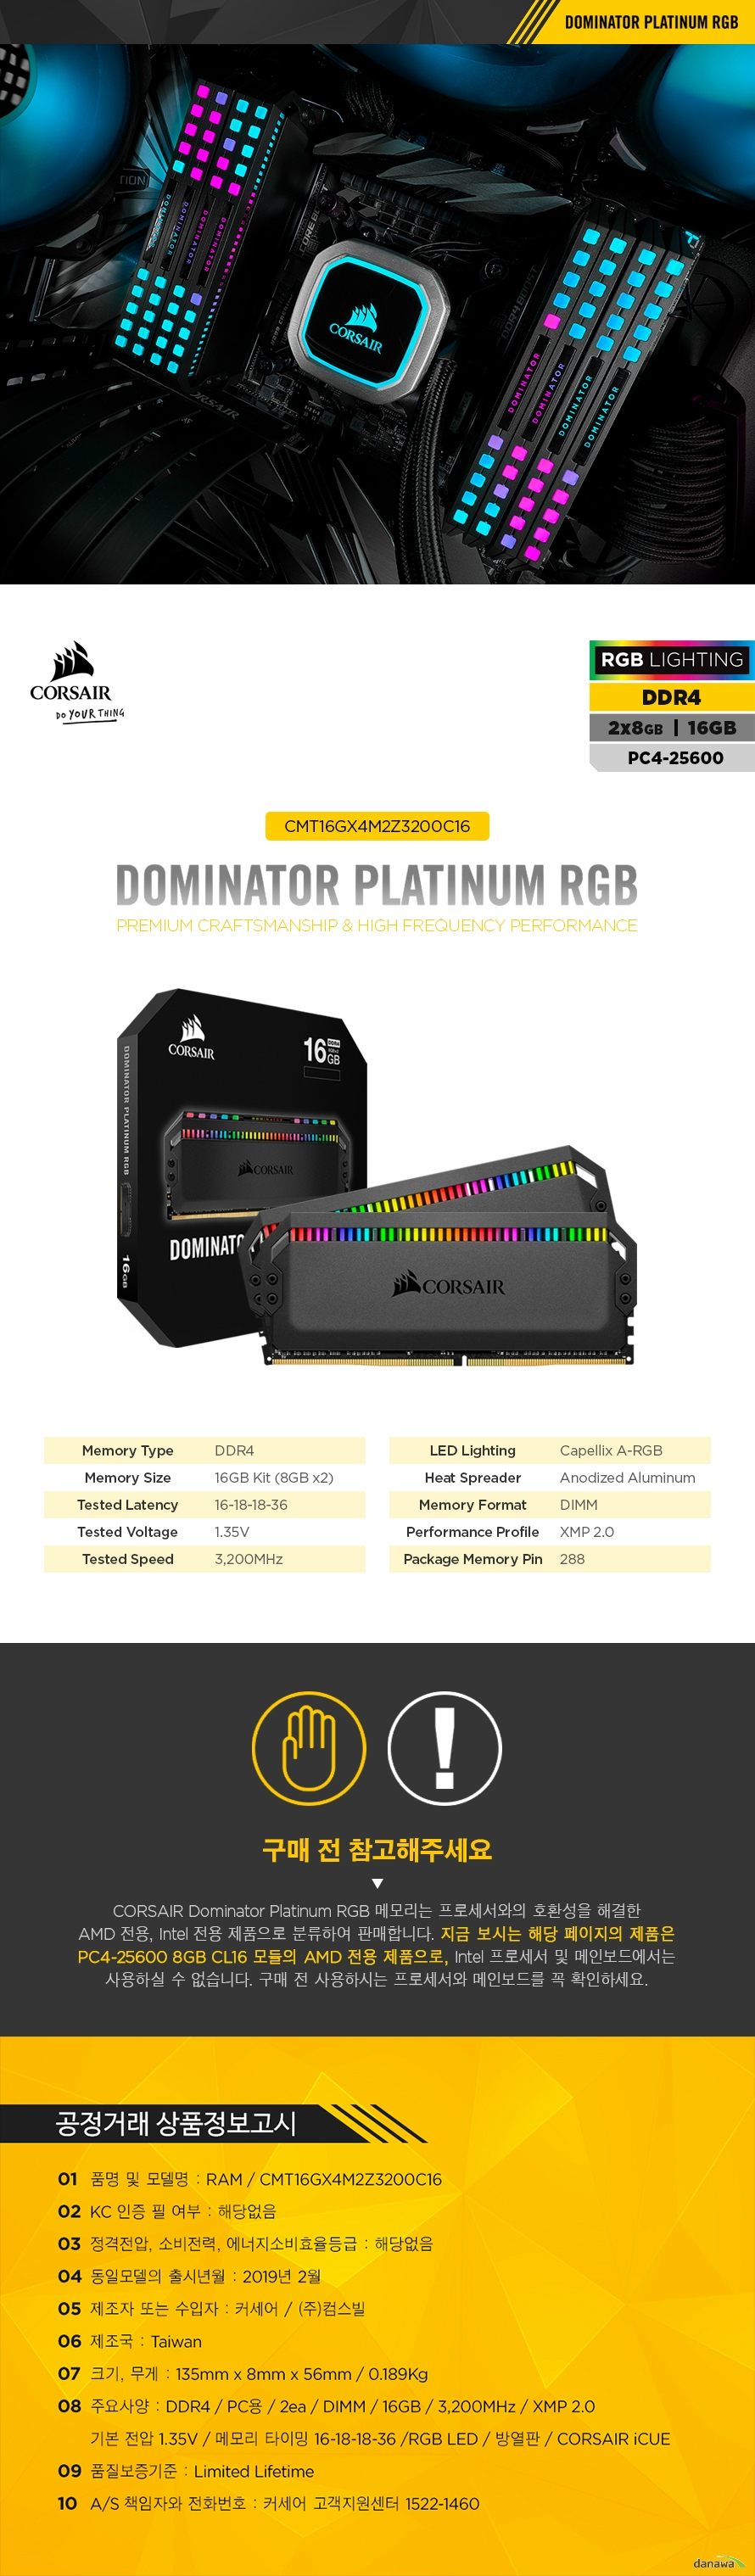 CORSAIR  DDR4 16G PC4-25600 CL16 Dominator Platinum RGB AMD (8Gx2)